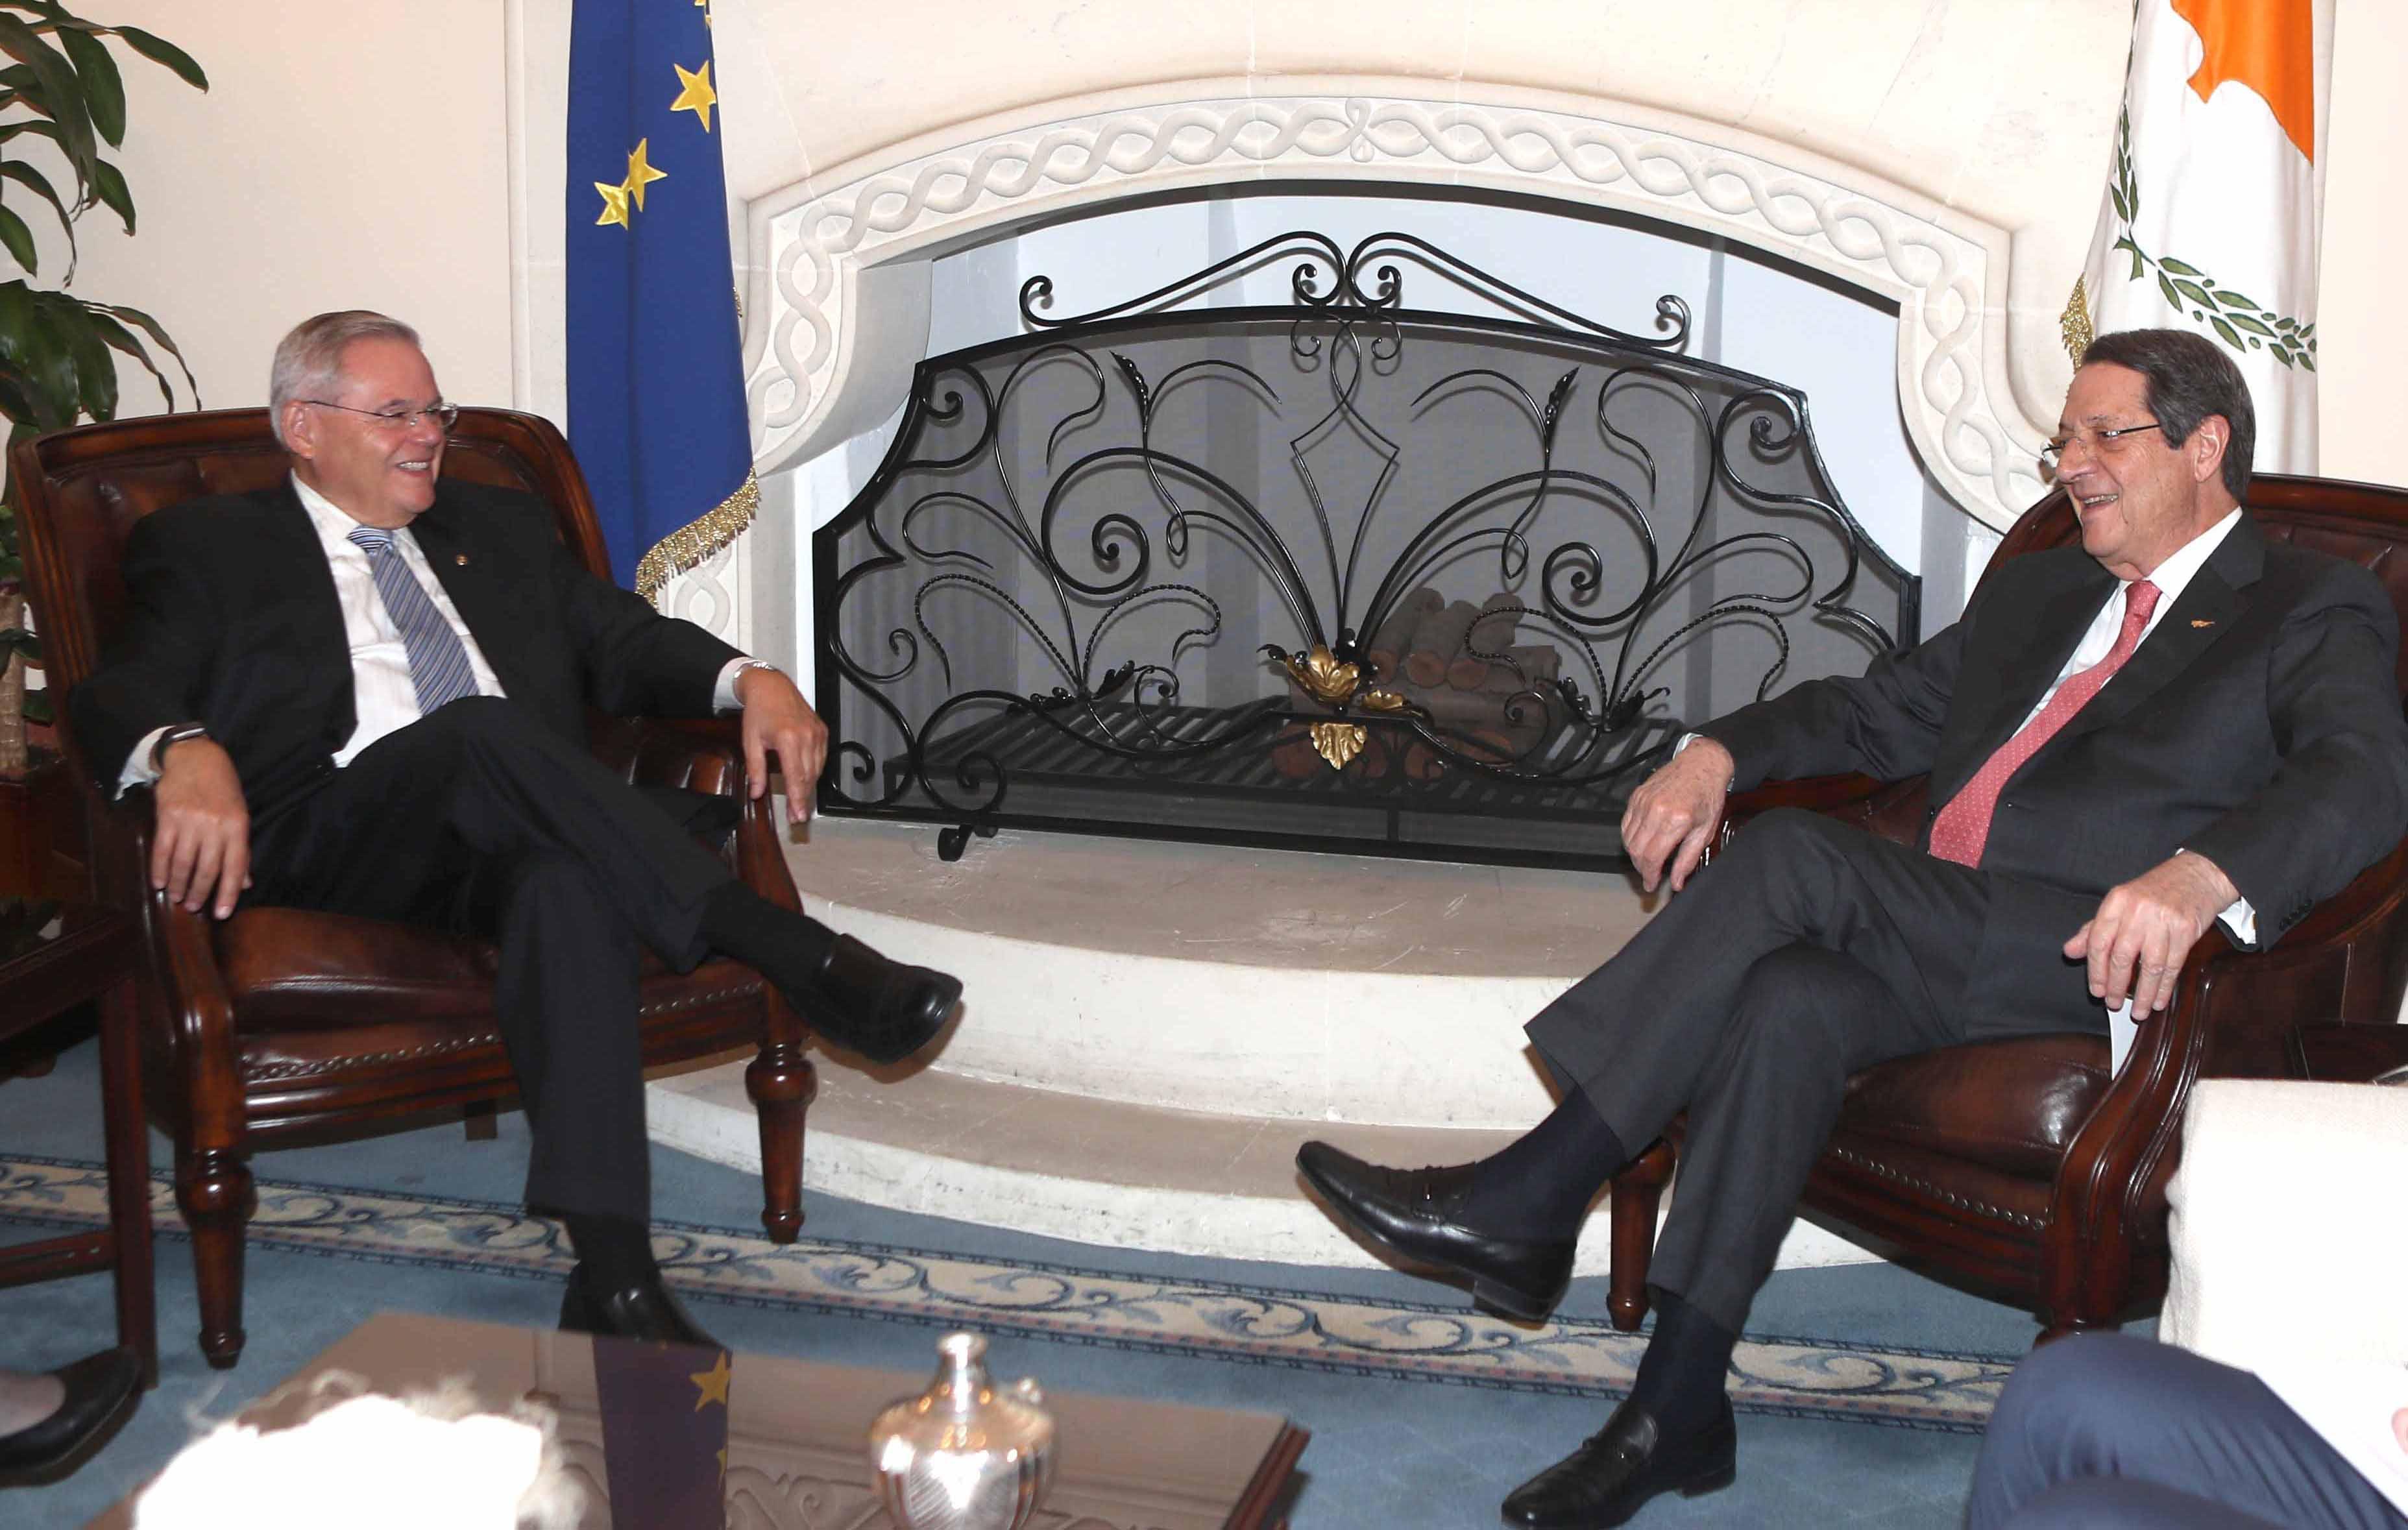 Menendez στην Κύπρο: Συναντήθηκε με Αναστασιάδη, στο τραπέζι το εμπάργκο